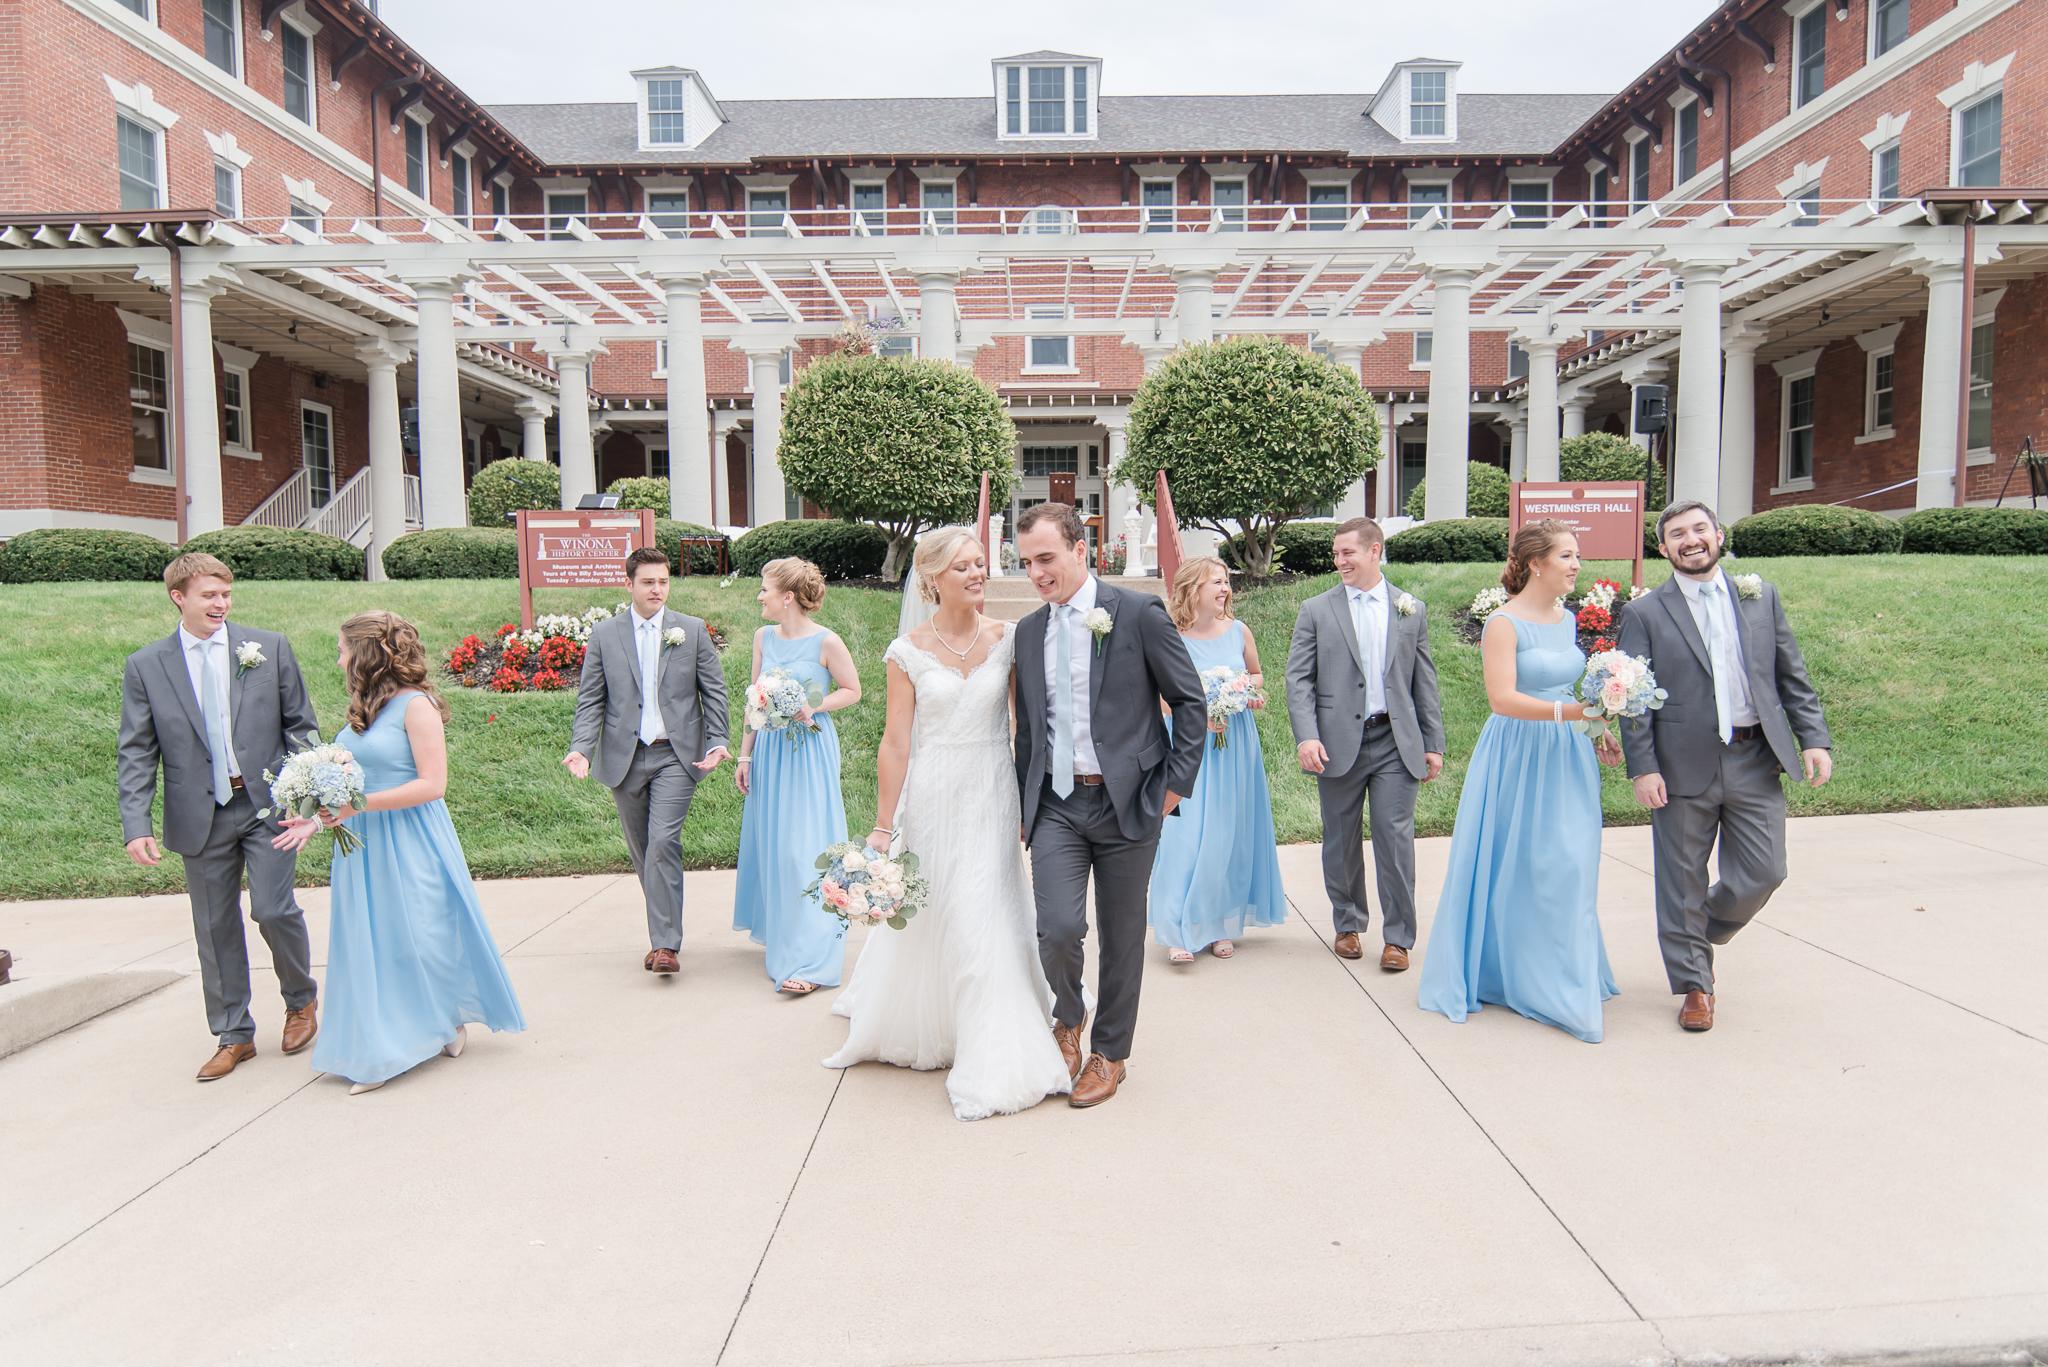 Westminister Hall Wedding Winona Lake Indiana9153.jpg